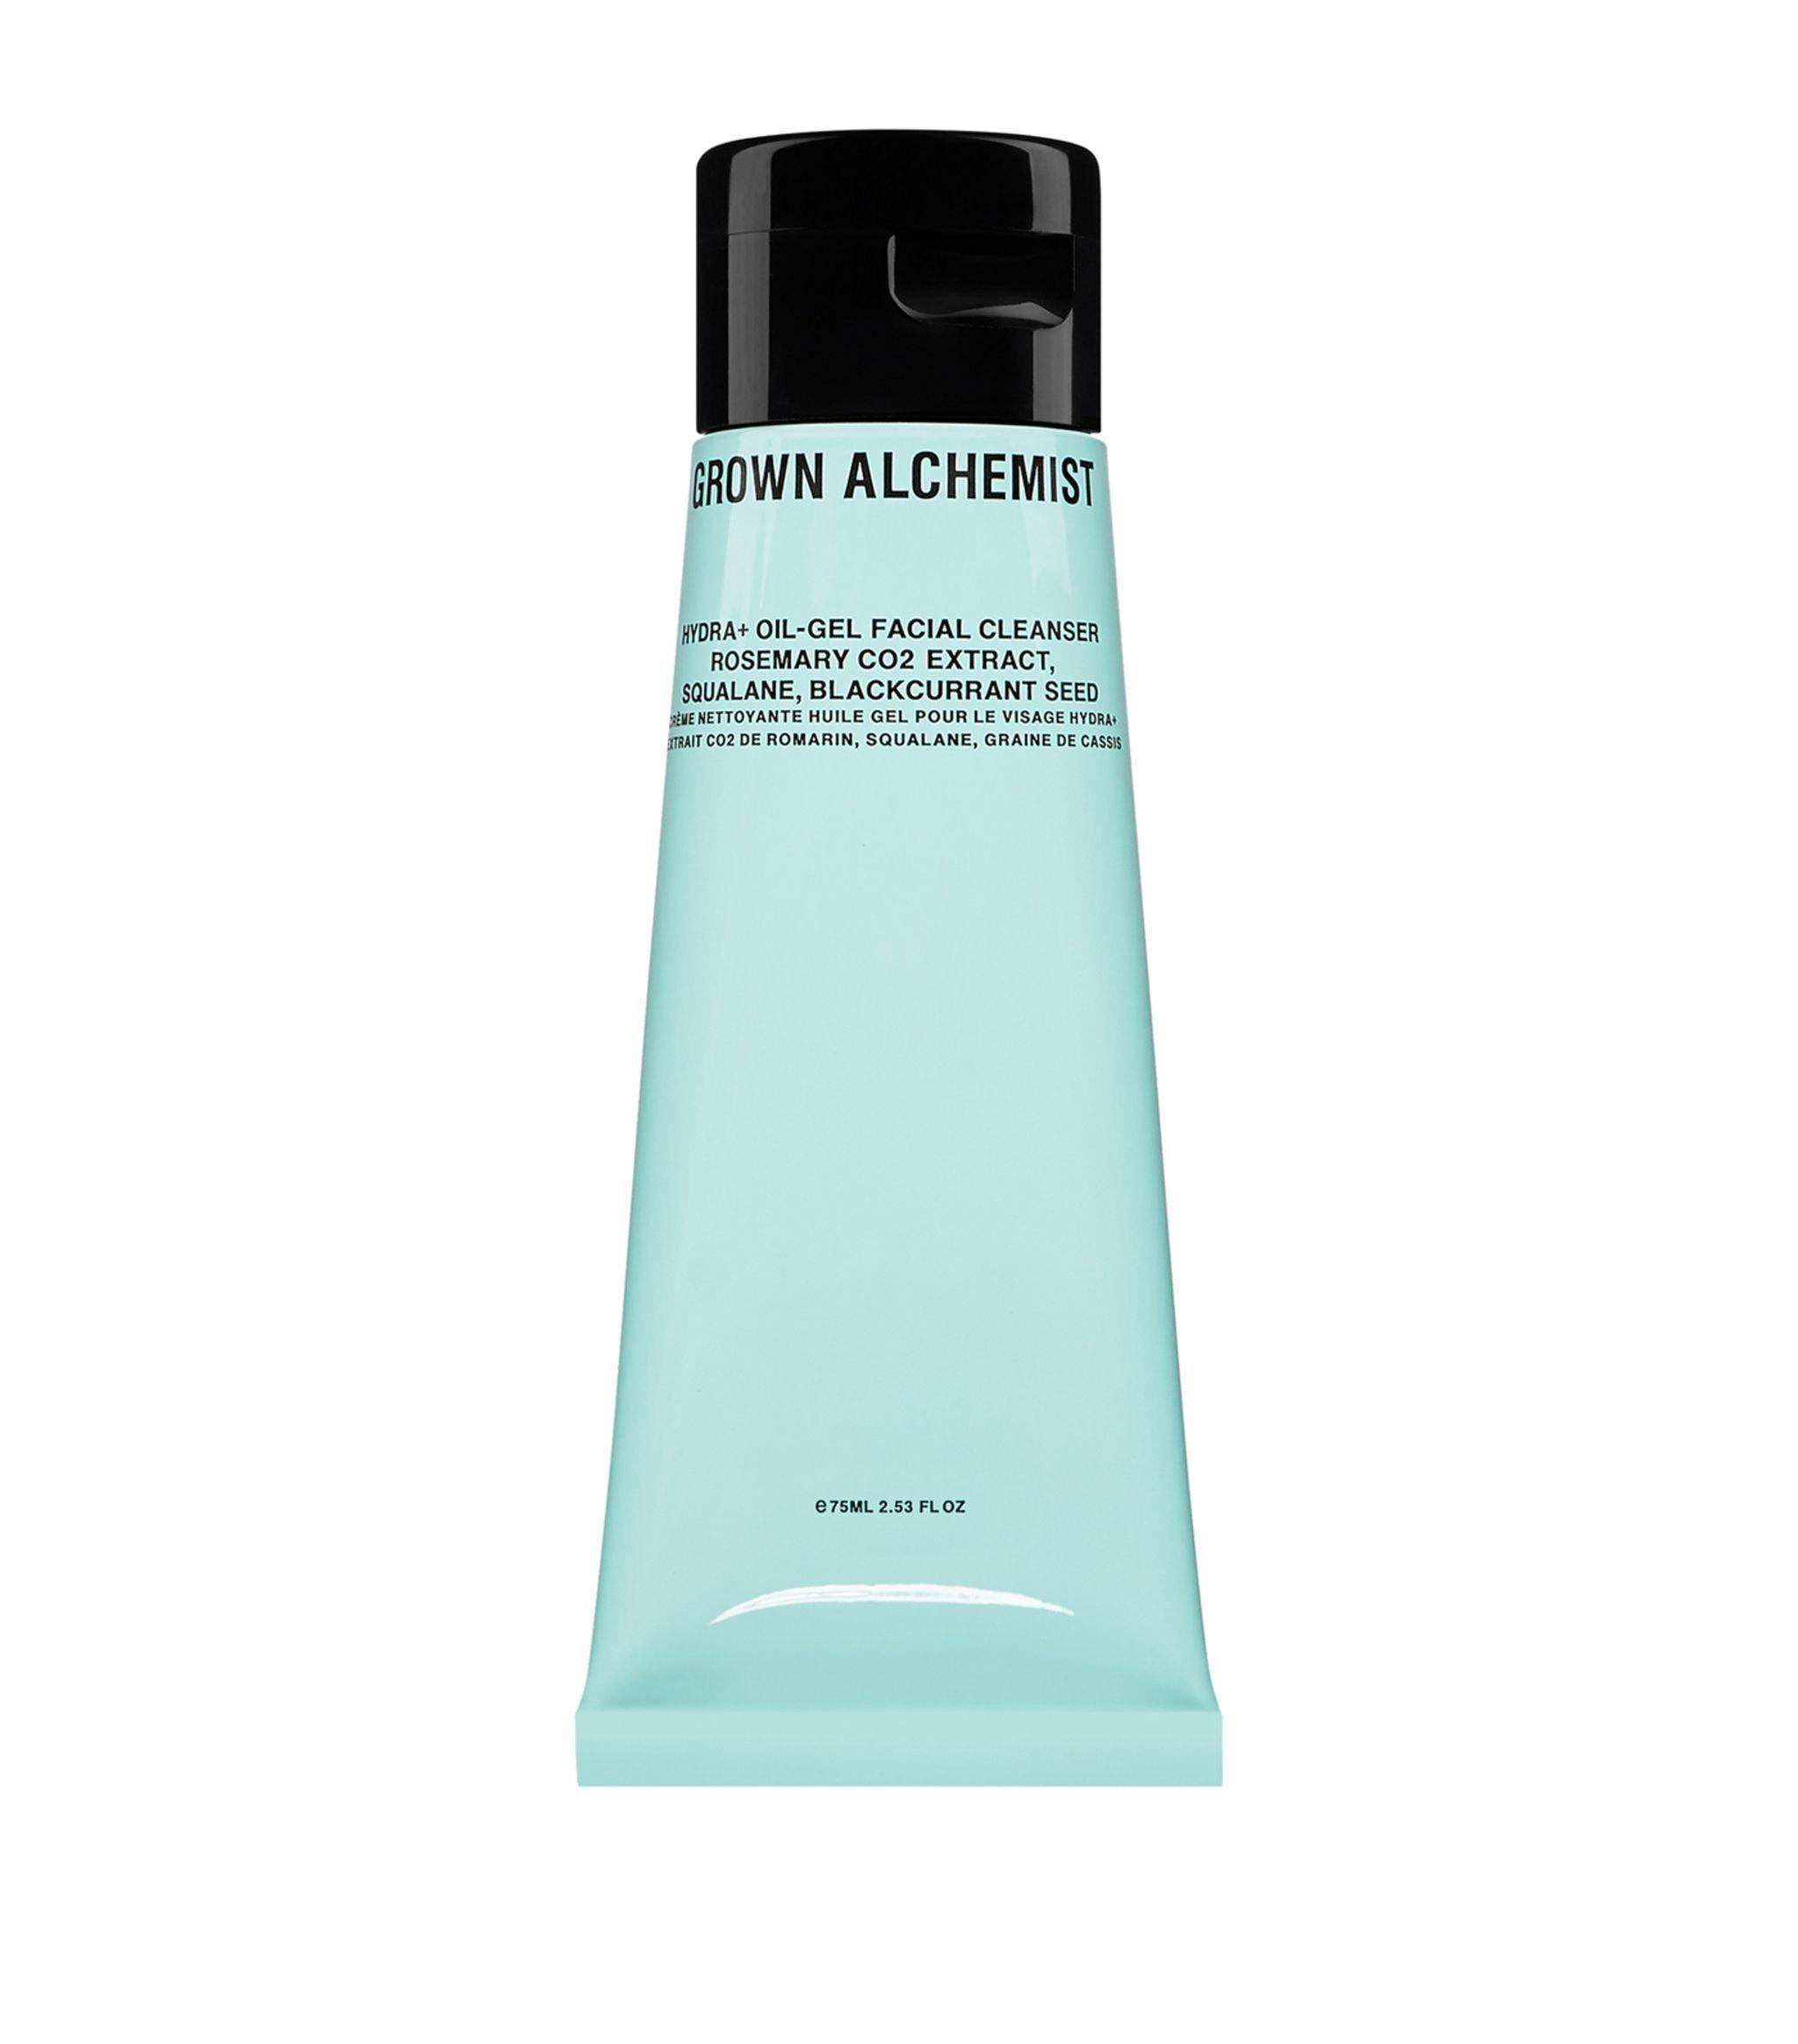 Hydra+ Oil Gel Facial Cleanser